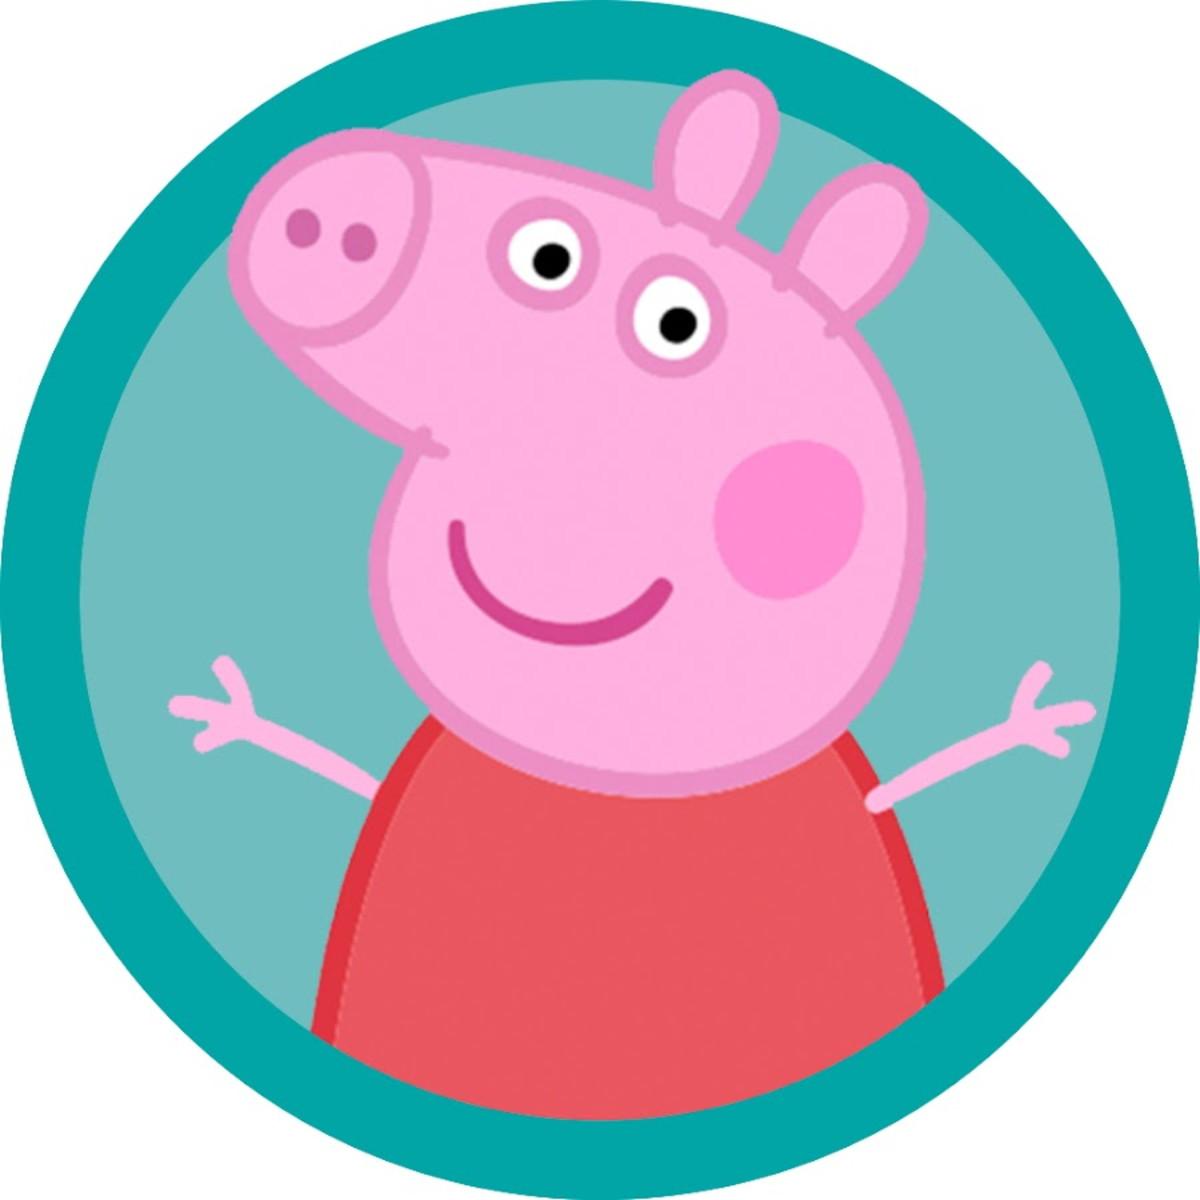 Peppa Pig: Pumpkin Party DVD £6.99 @ Amazon (Plus £3 Instant Video Credit)